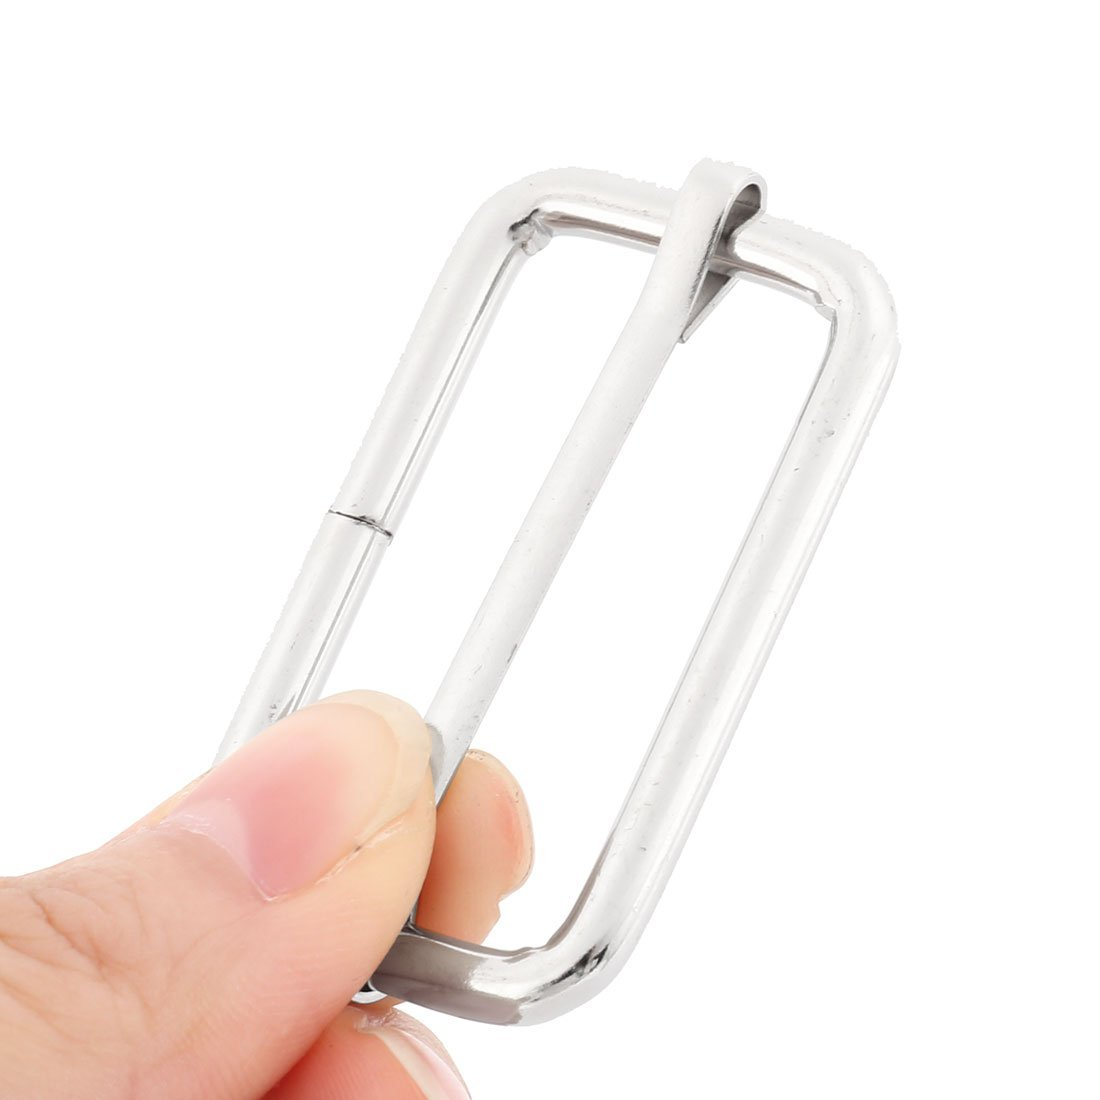 EbuyChX Bag Metal Bagahe Parihaba Belt Adjustive Tri Glide Buckle 10 Pcs Silver Tone